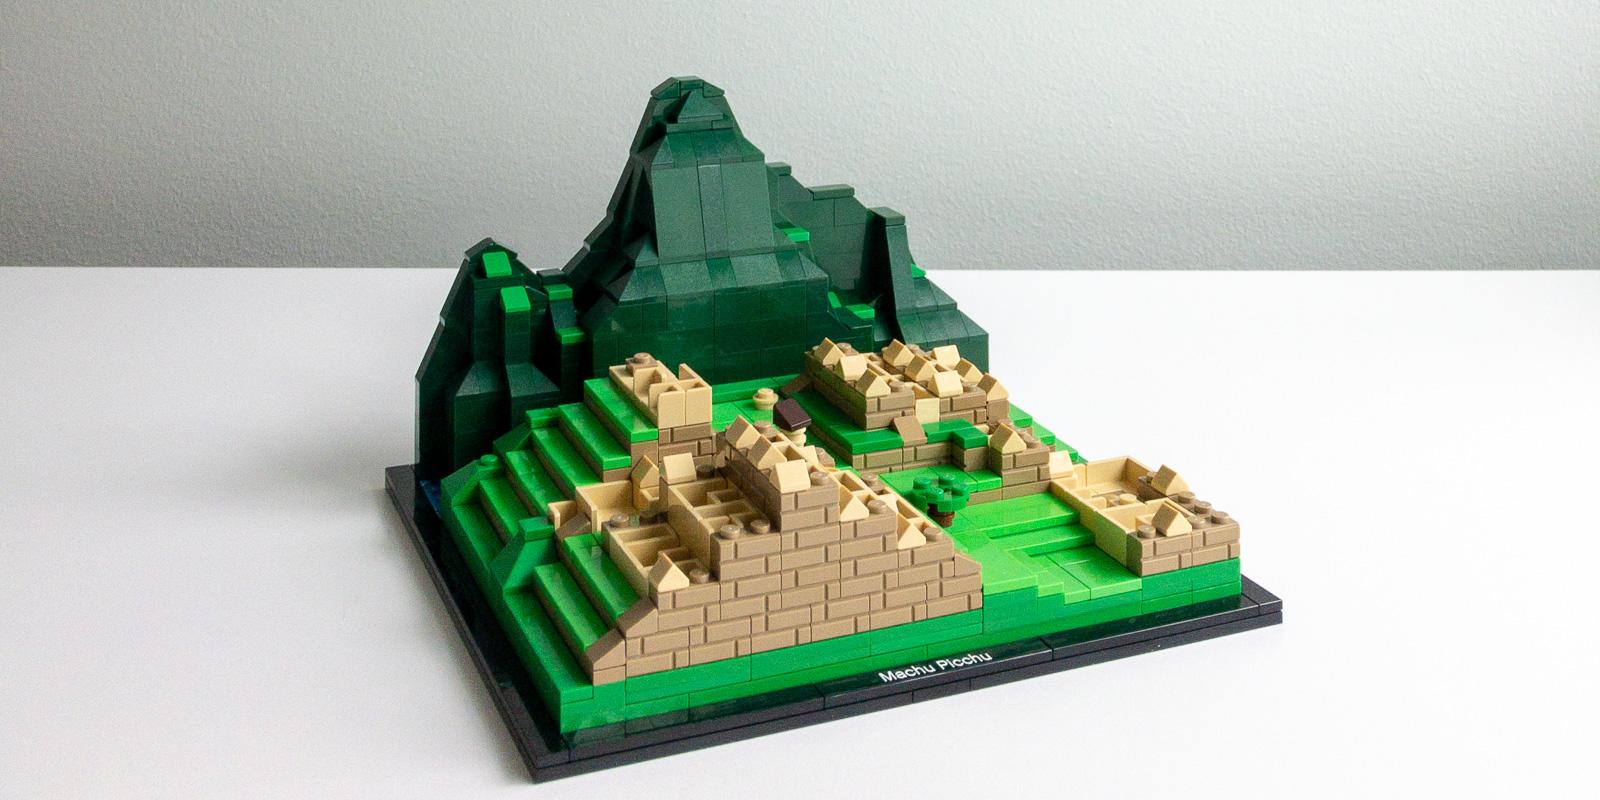 LEGO LOT OF 500 BLACK 1 X 4 PLATES BUILDING BLOCKS PIECES